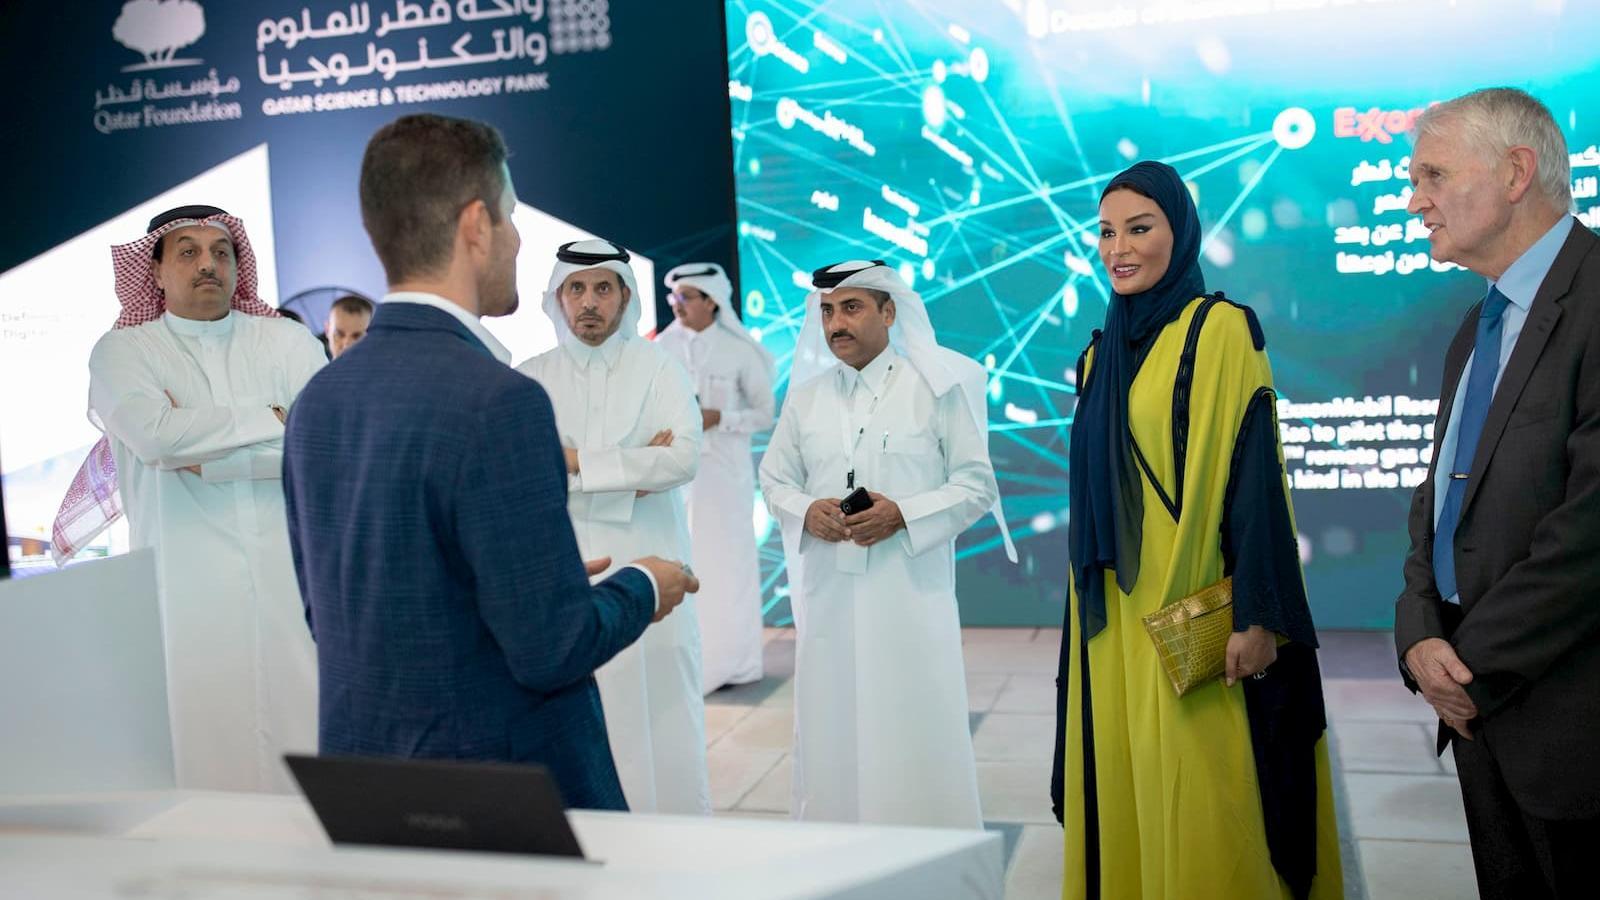 HH Sheikha Moza attends QSTP's 10th anniversary celebration